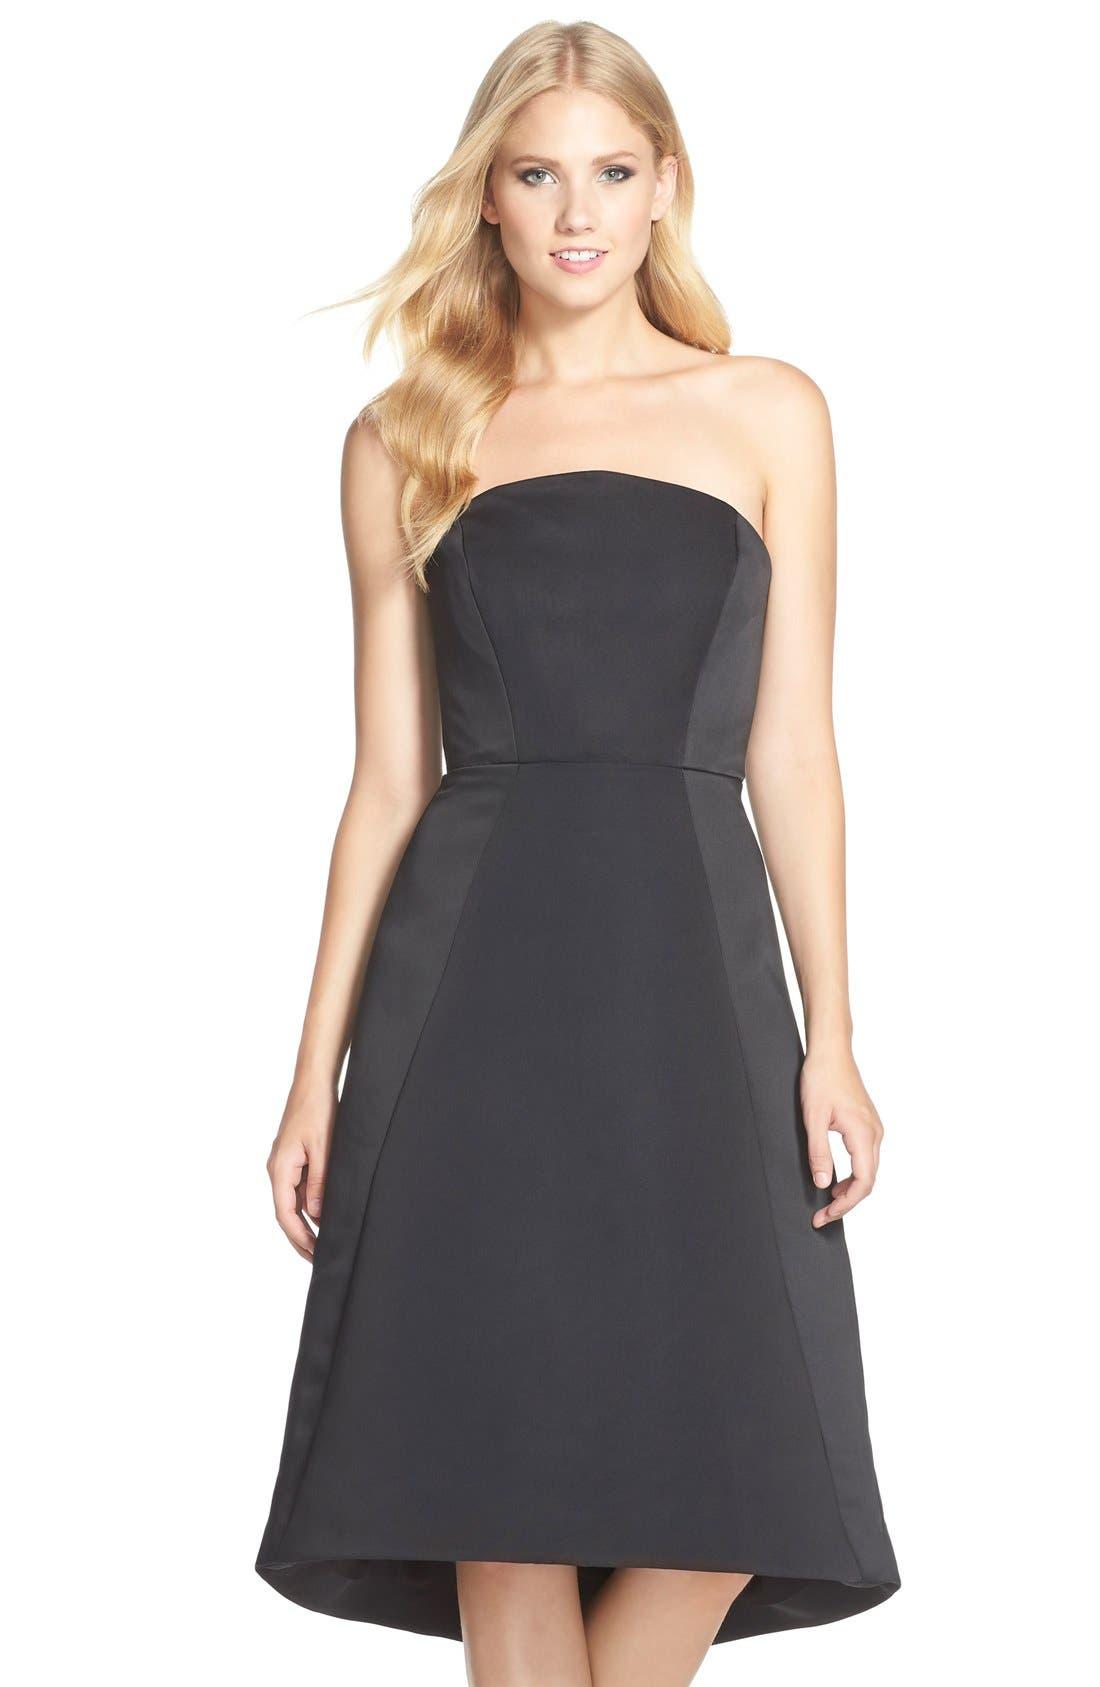 Alternate Image 1 Selected - HalstonHeritage Strapless Satin Fit & Flare Dress